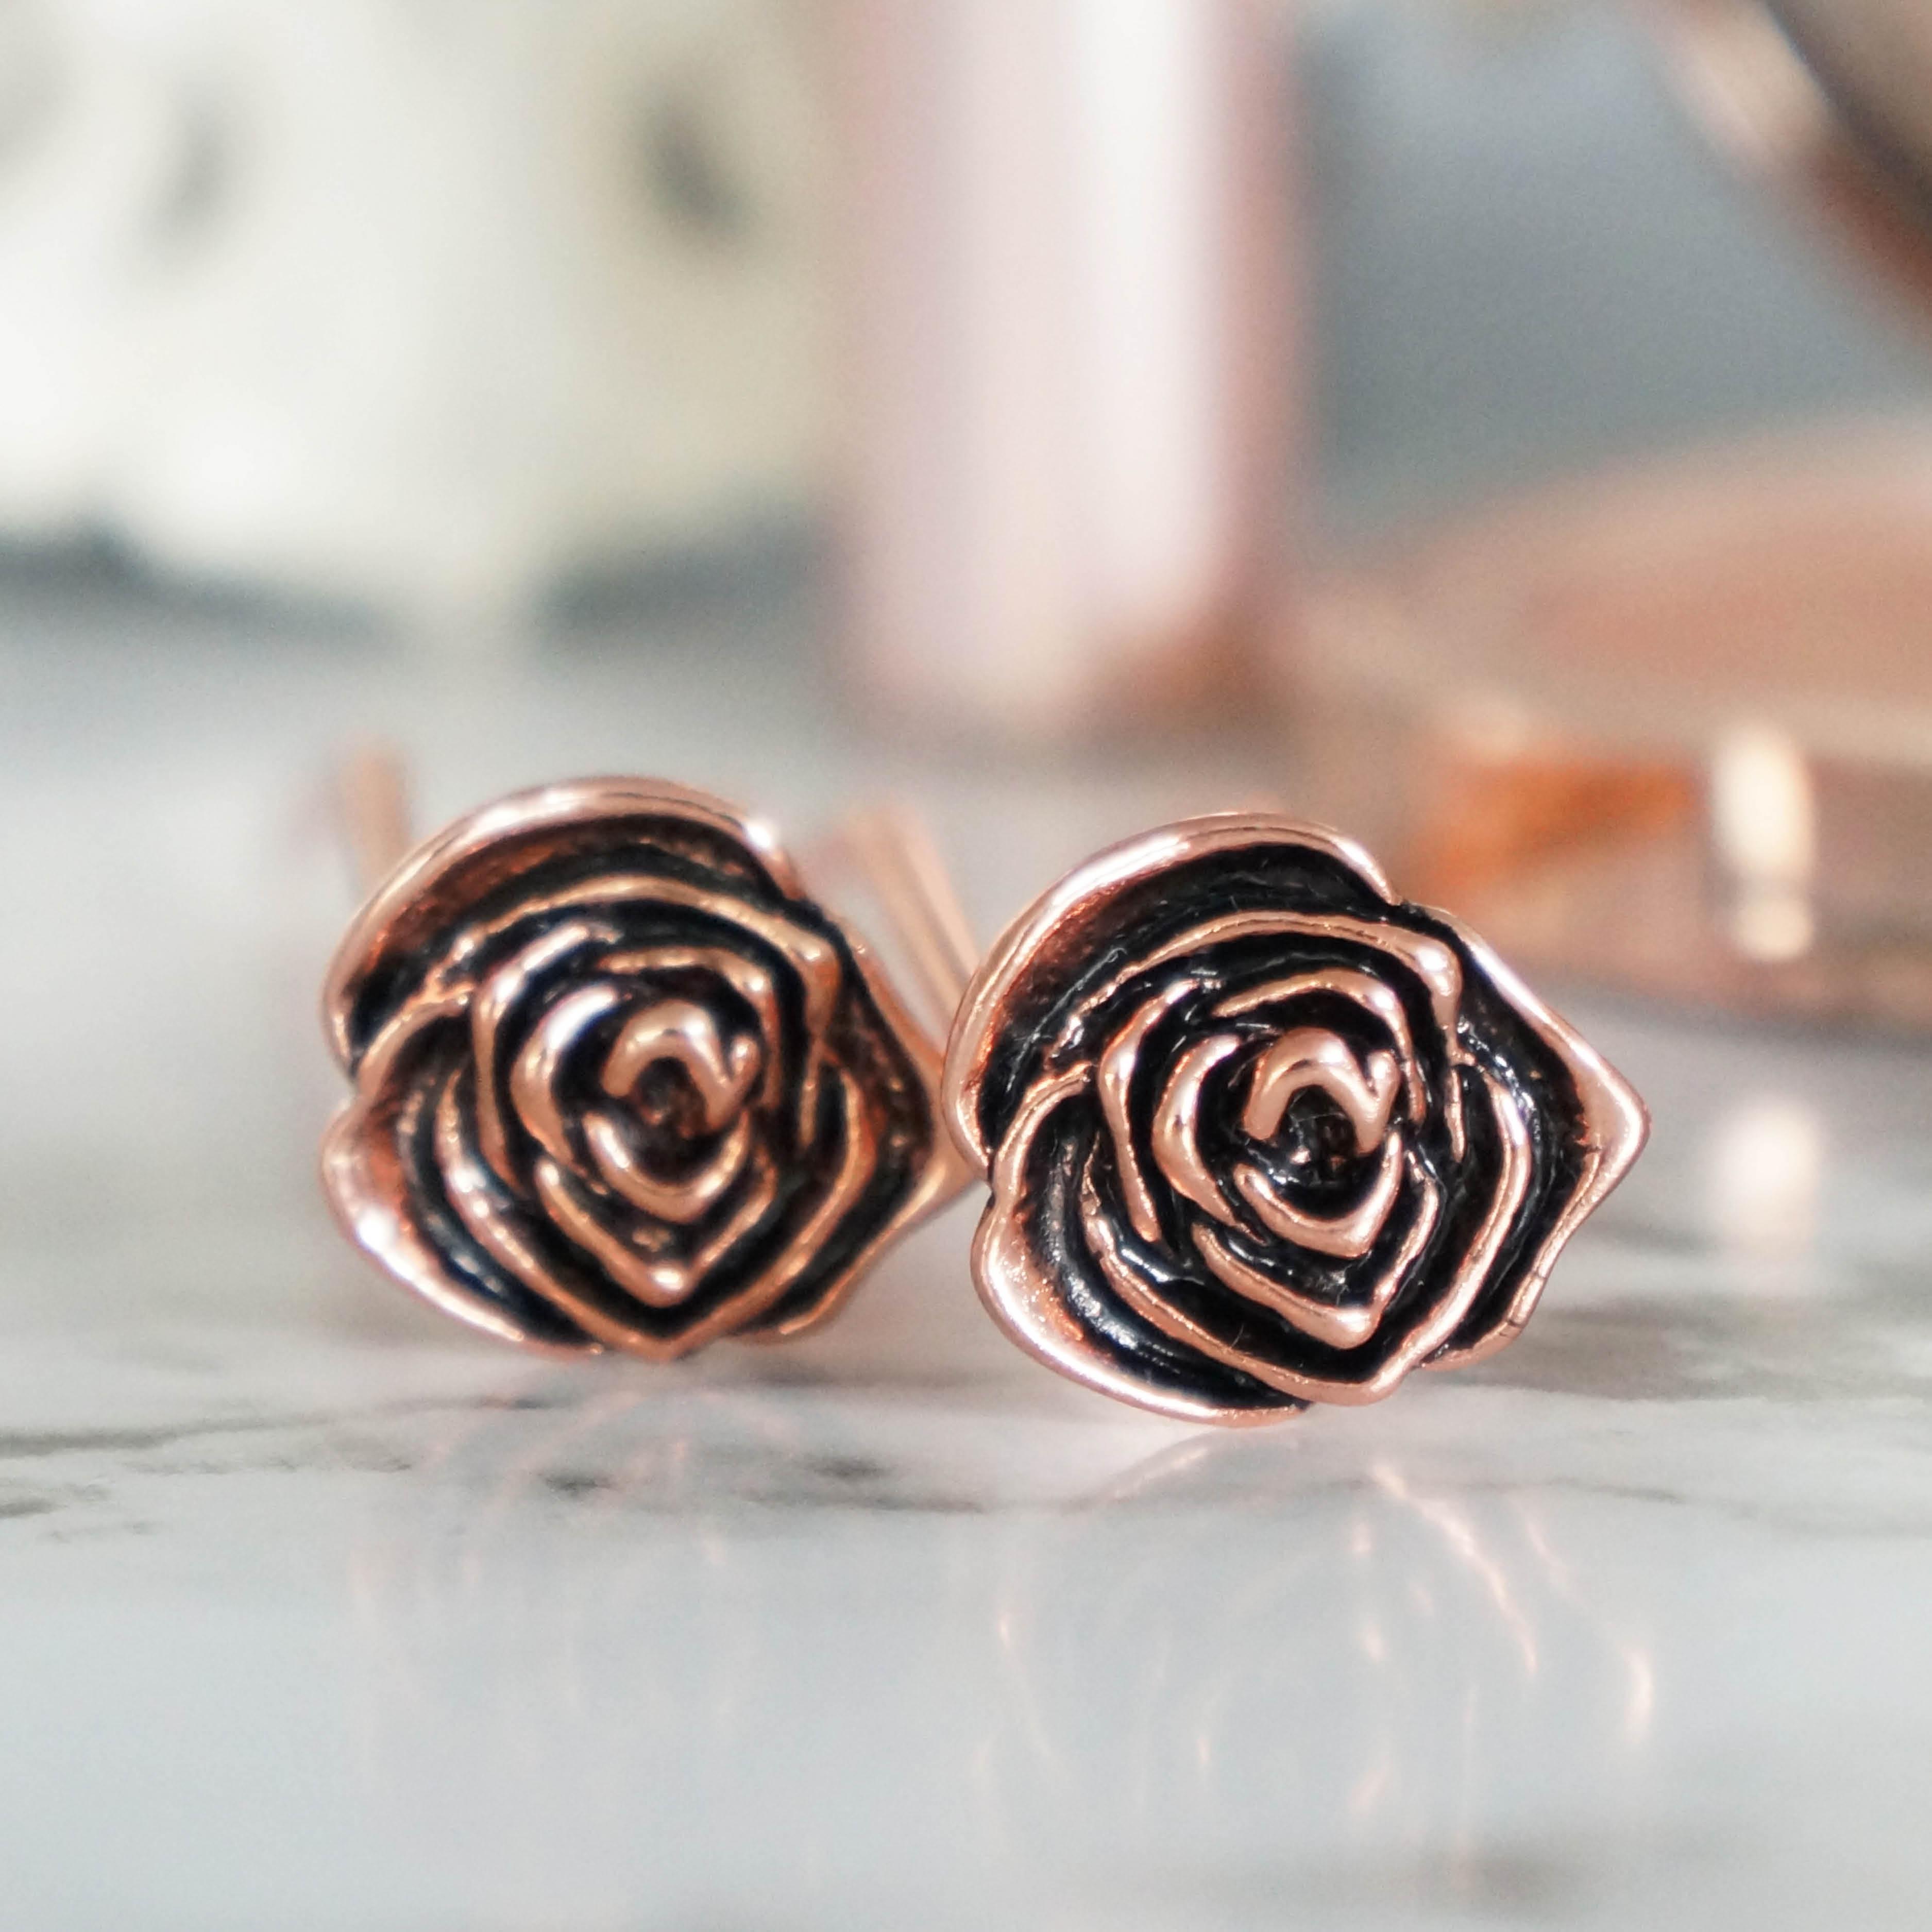 UP-2017_Copper Rose_2019-01